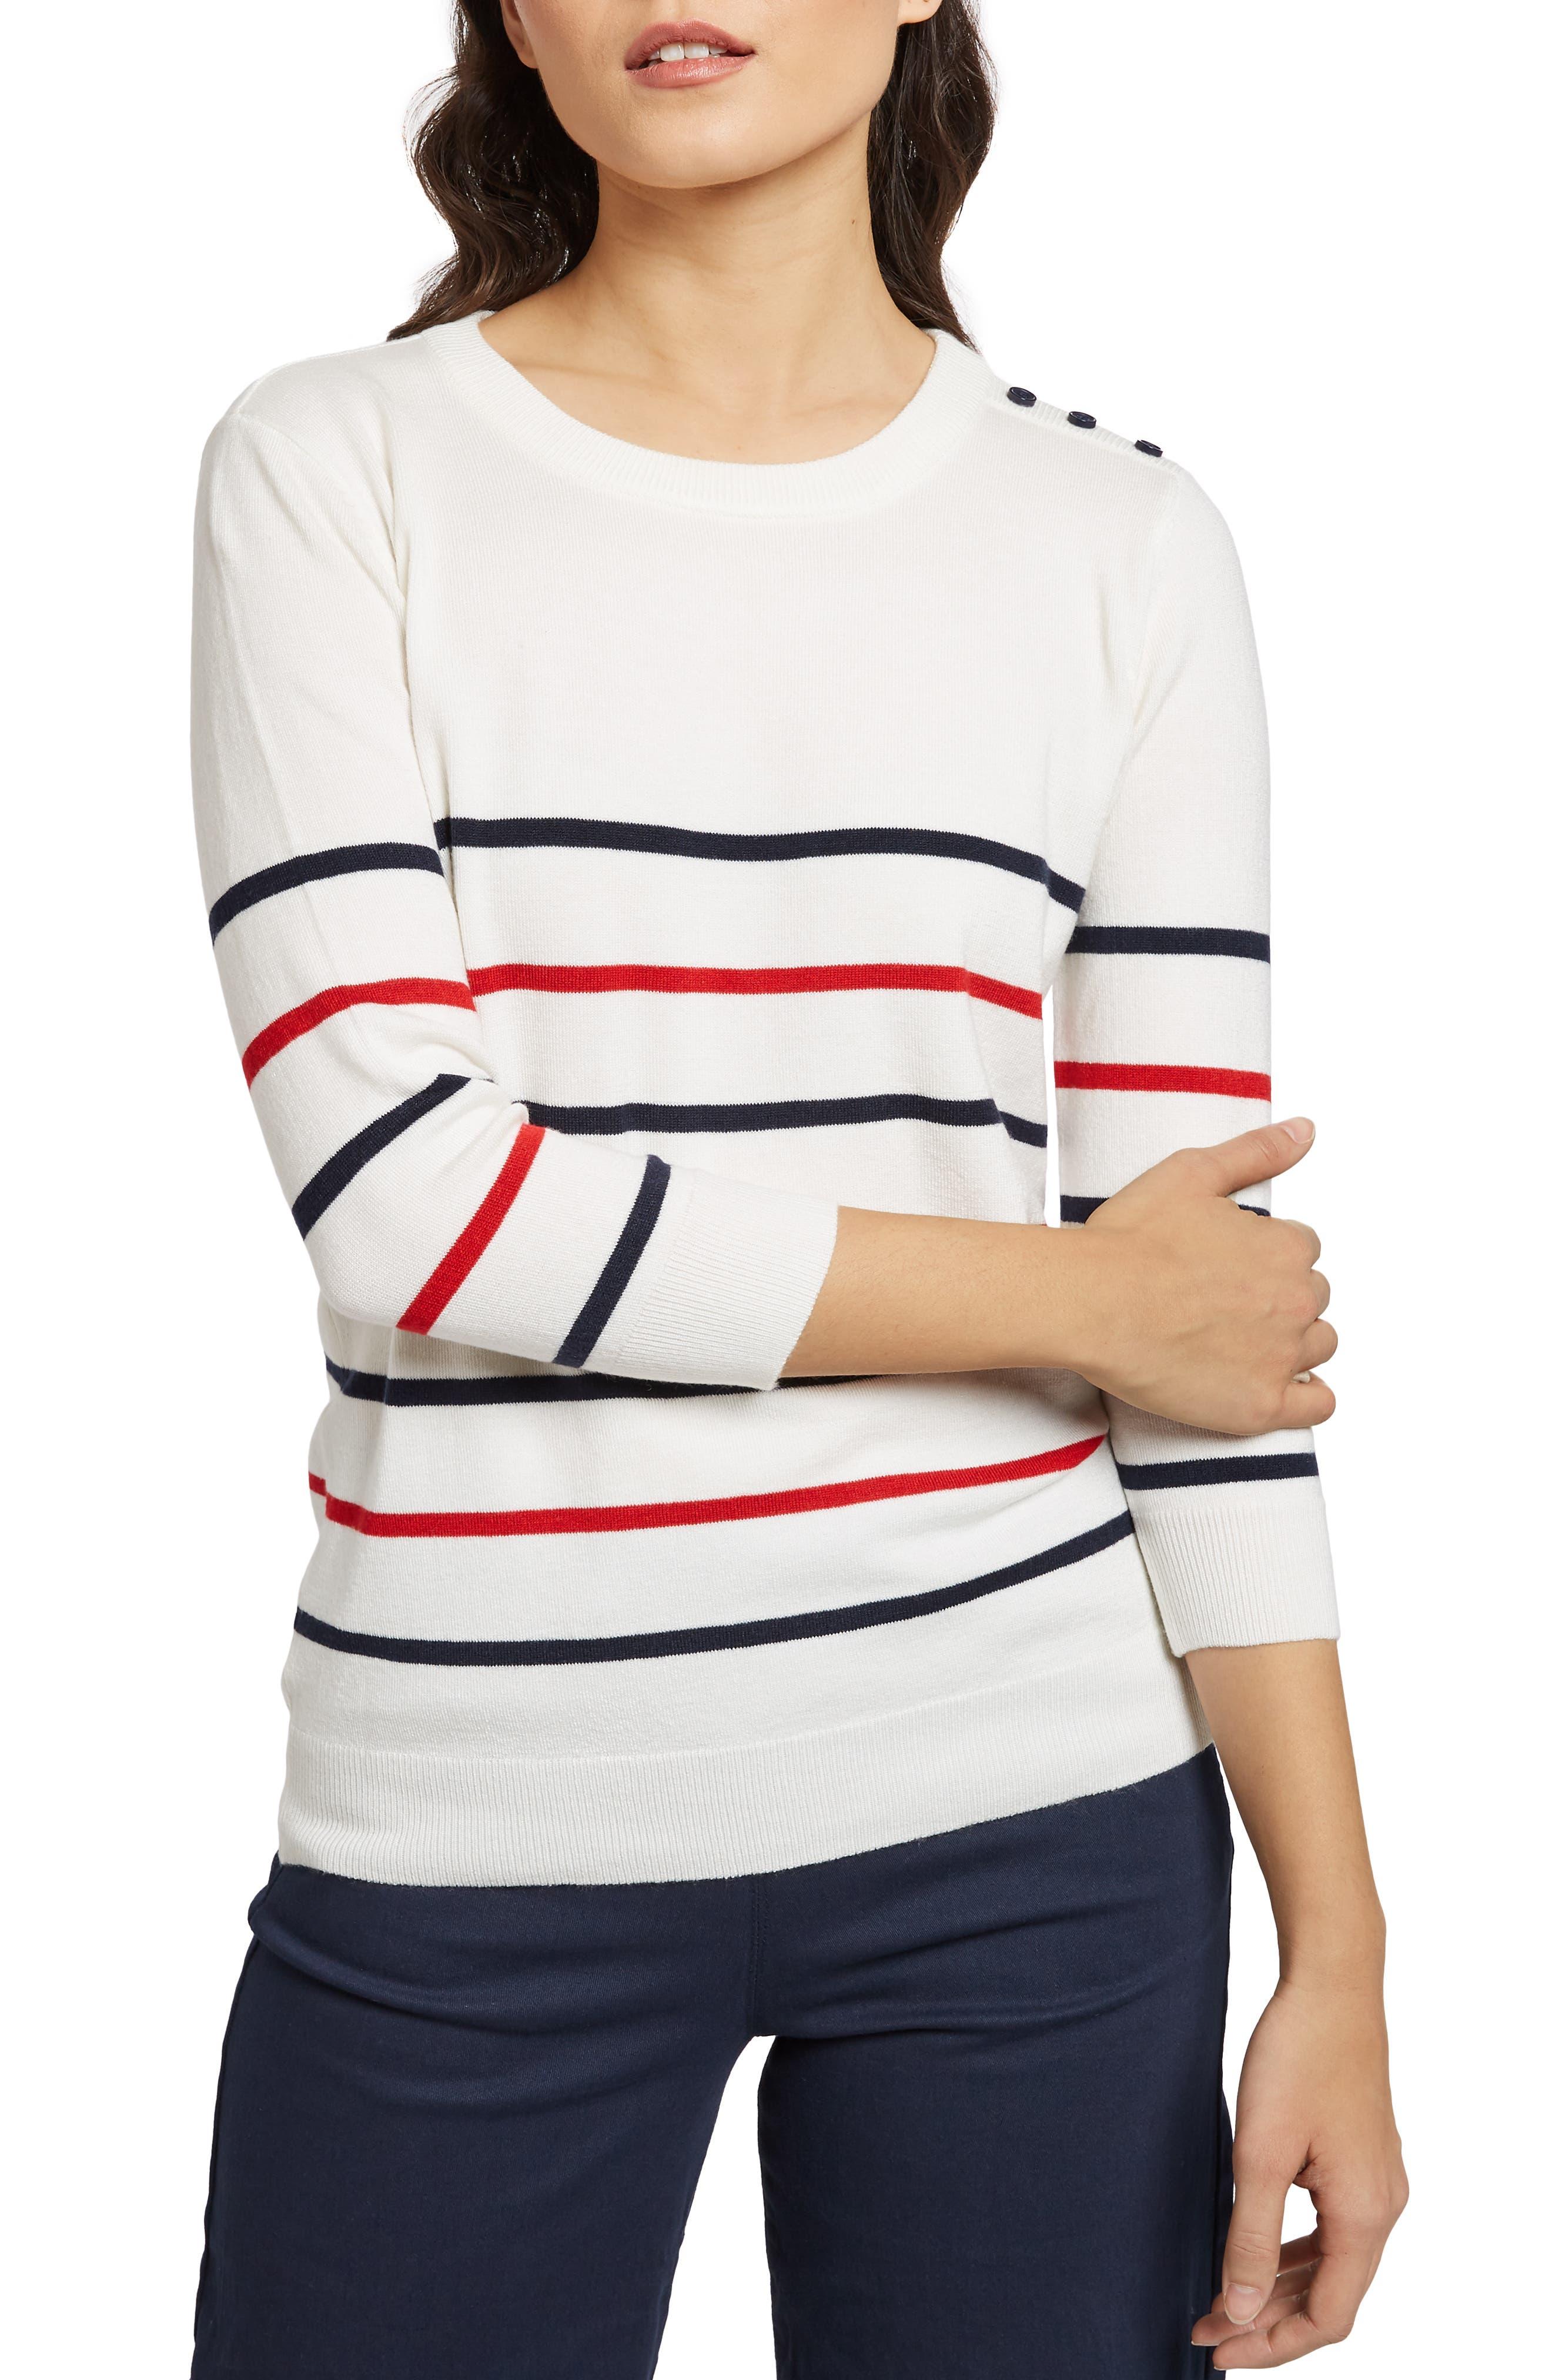 MODCLOTH, Charter School Stripe Sweater, Main thumbnail 1, color, 901